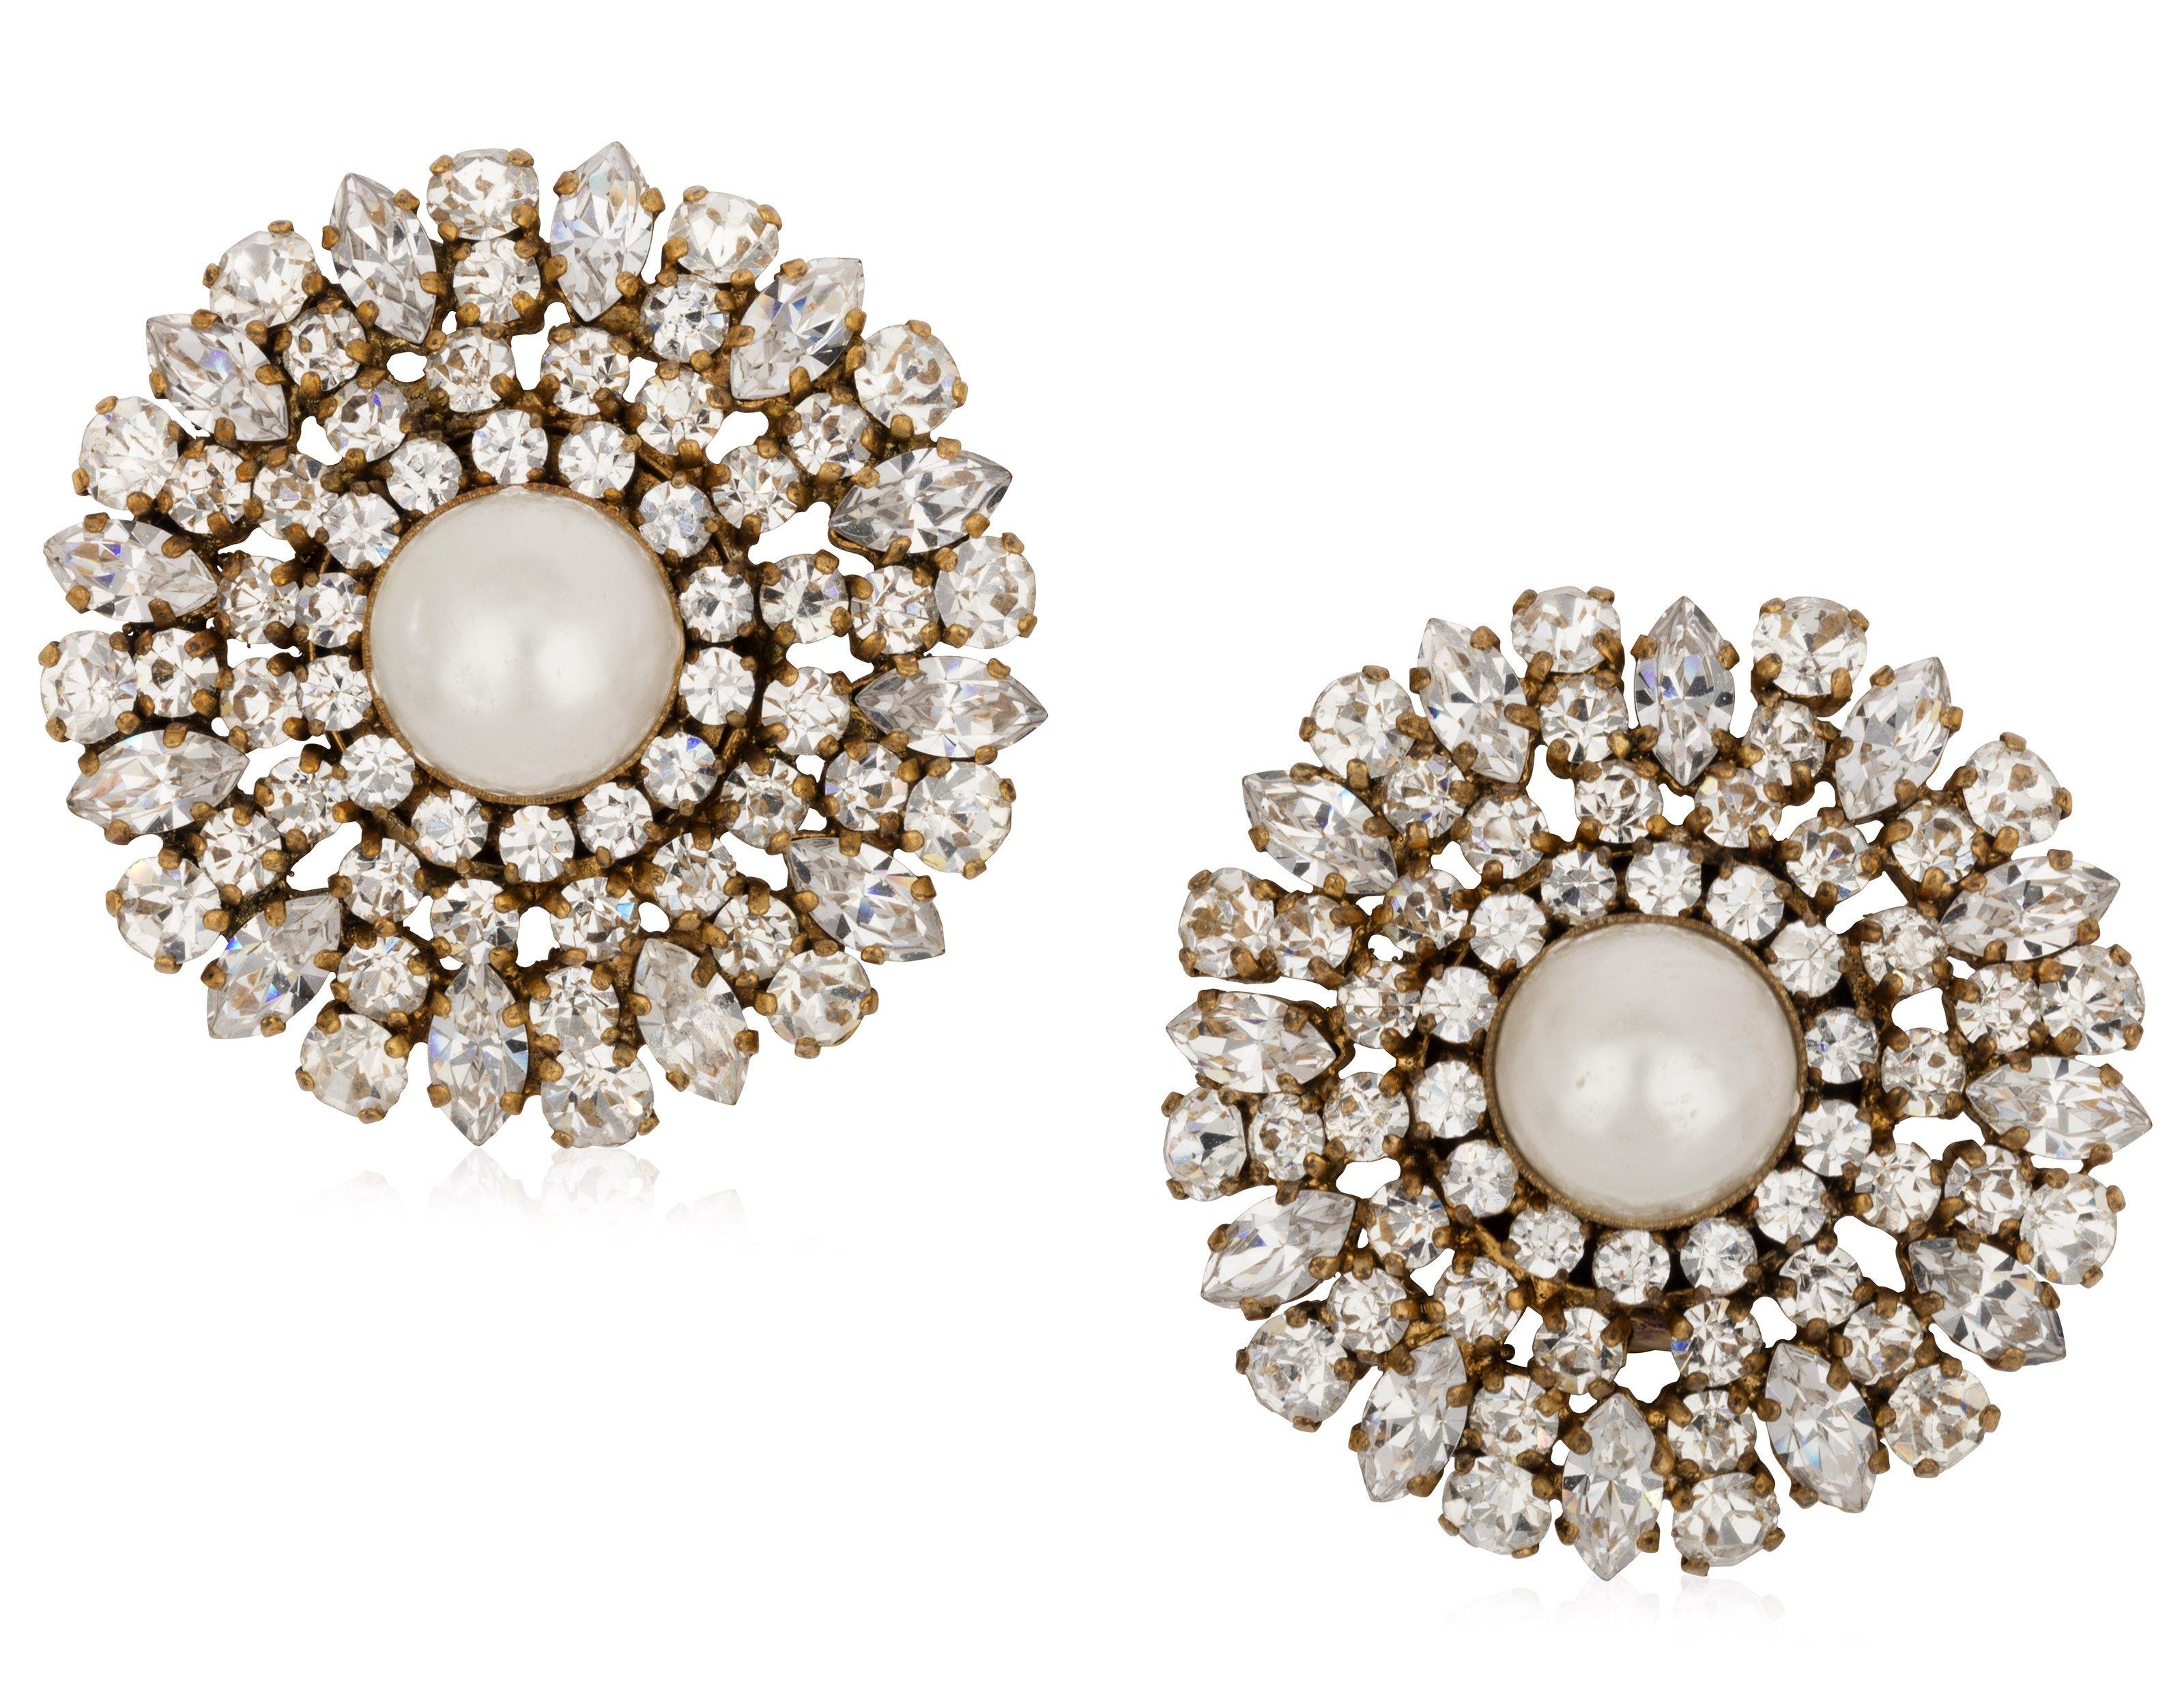 Chanel Faux Pearl And Rhinestone Earrings Vintage Never Die